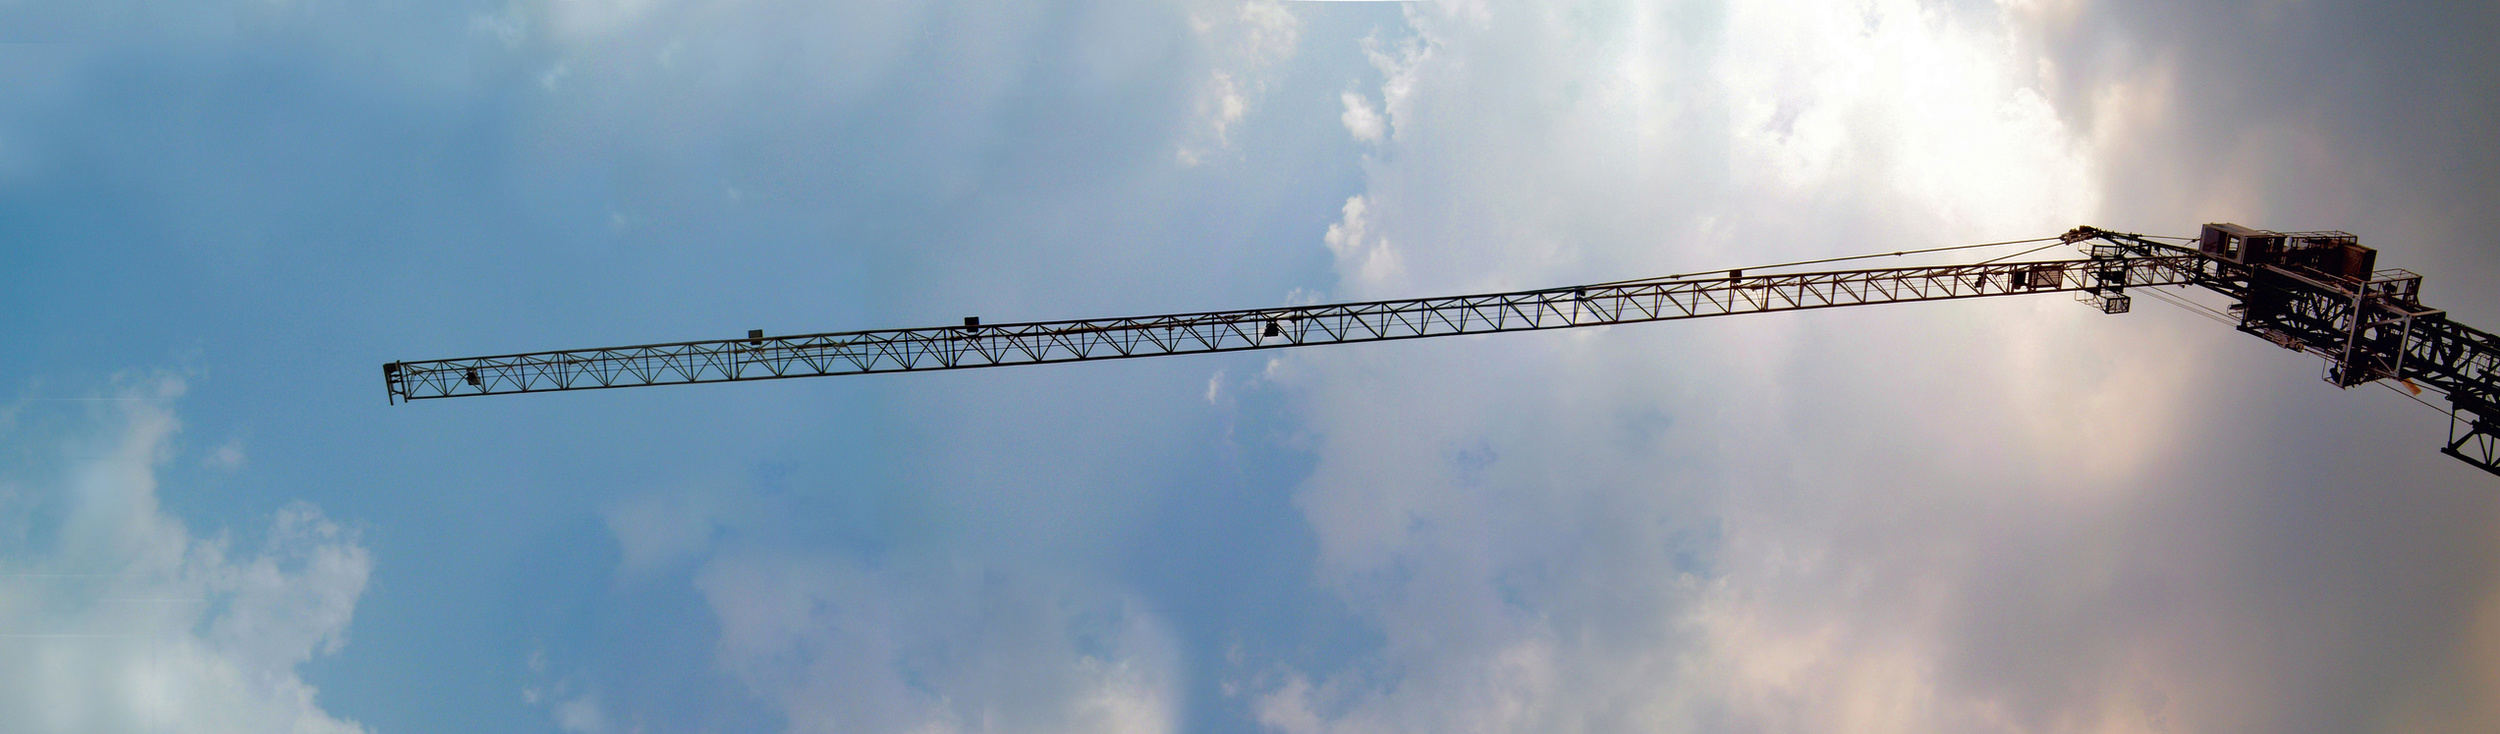 Bocabeautiful-Crane-FL3789053_M.jpg